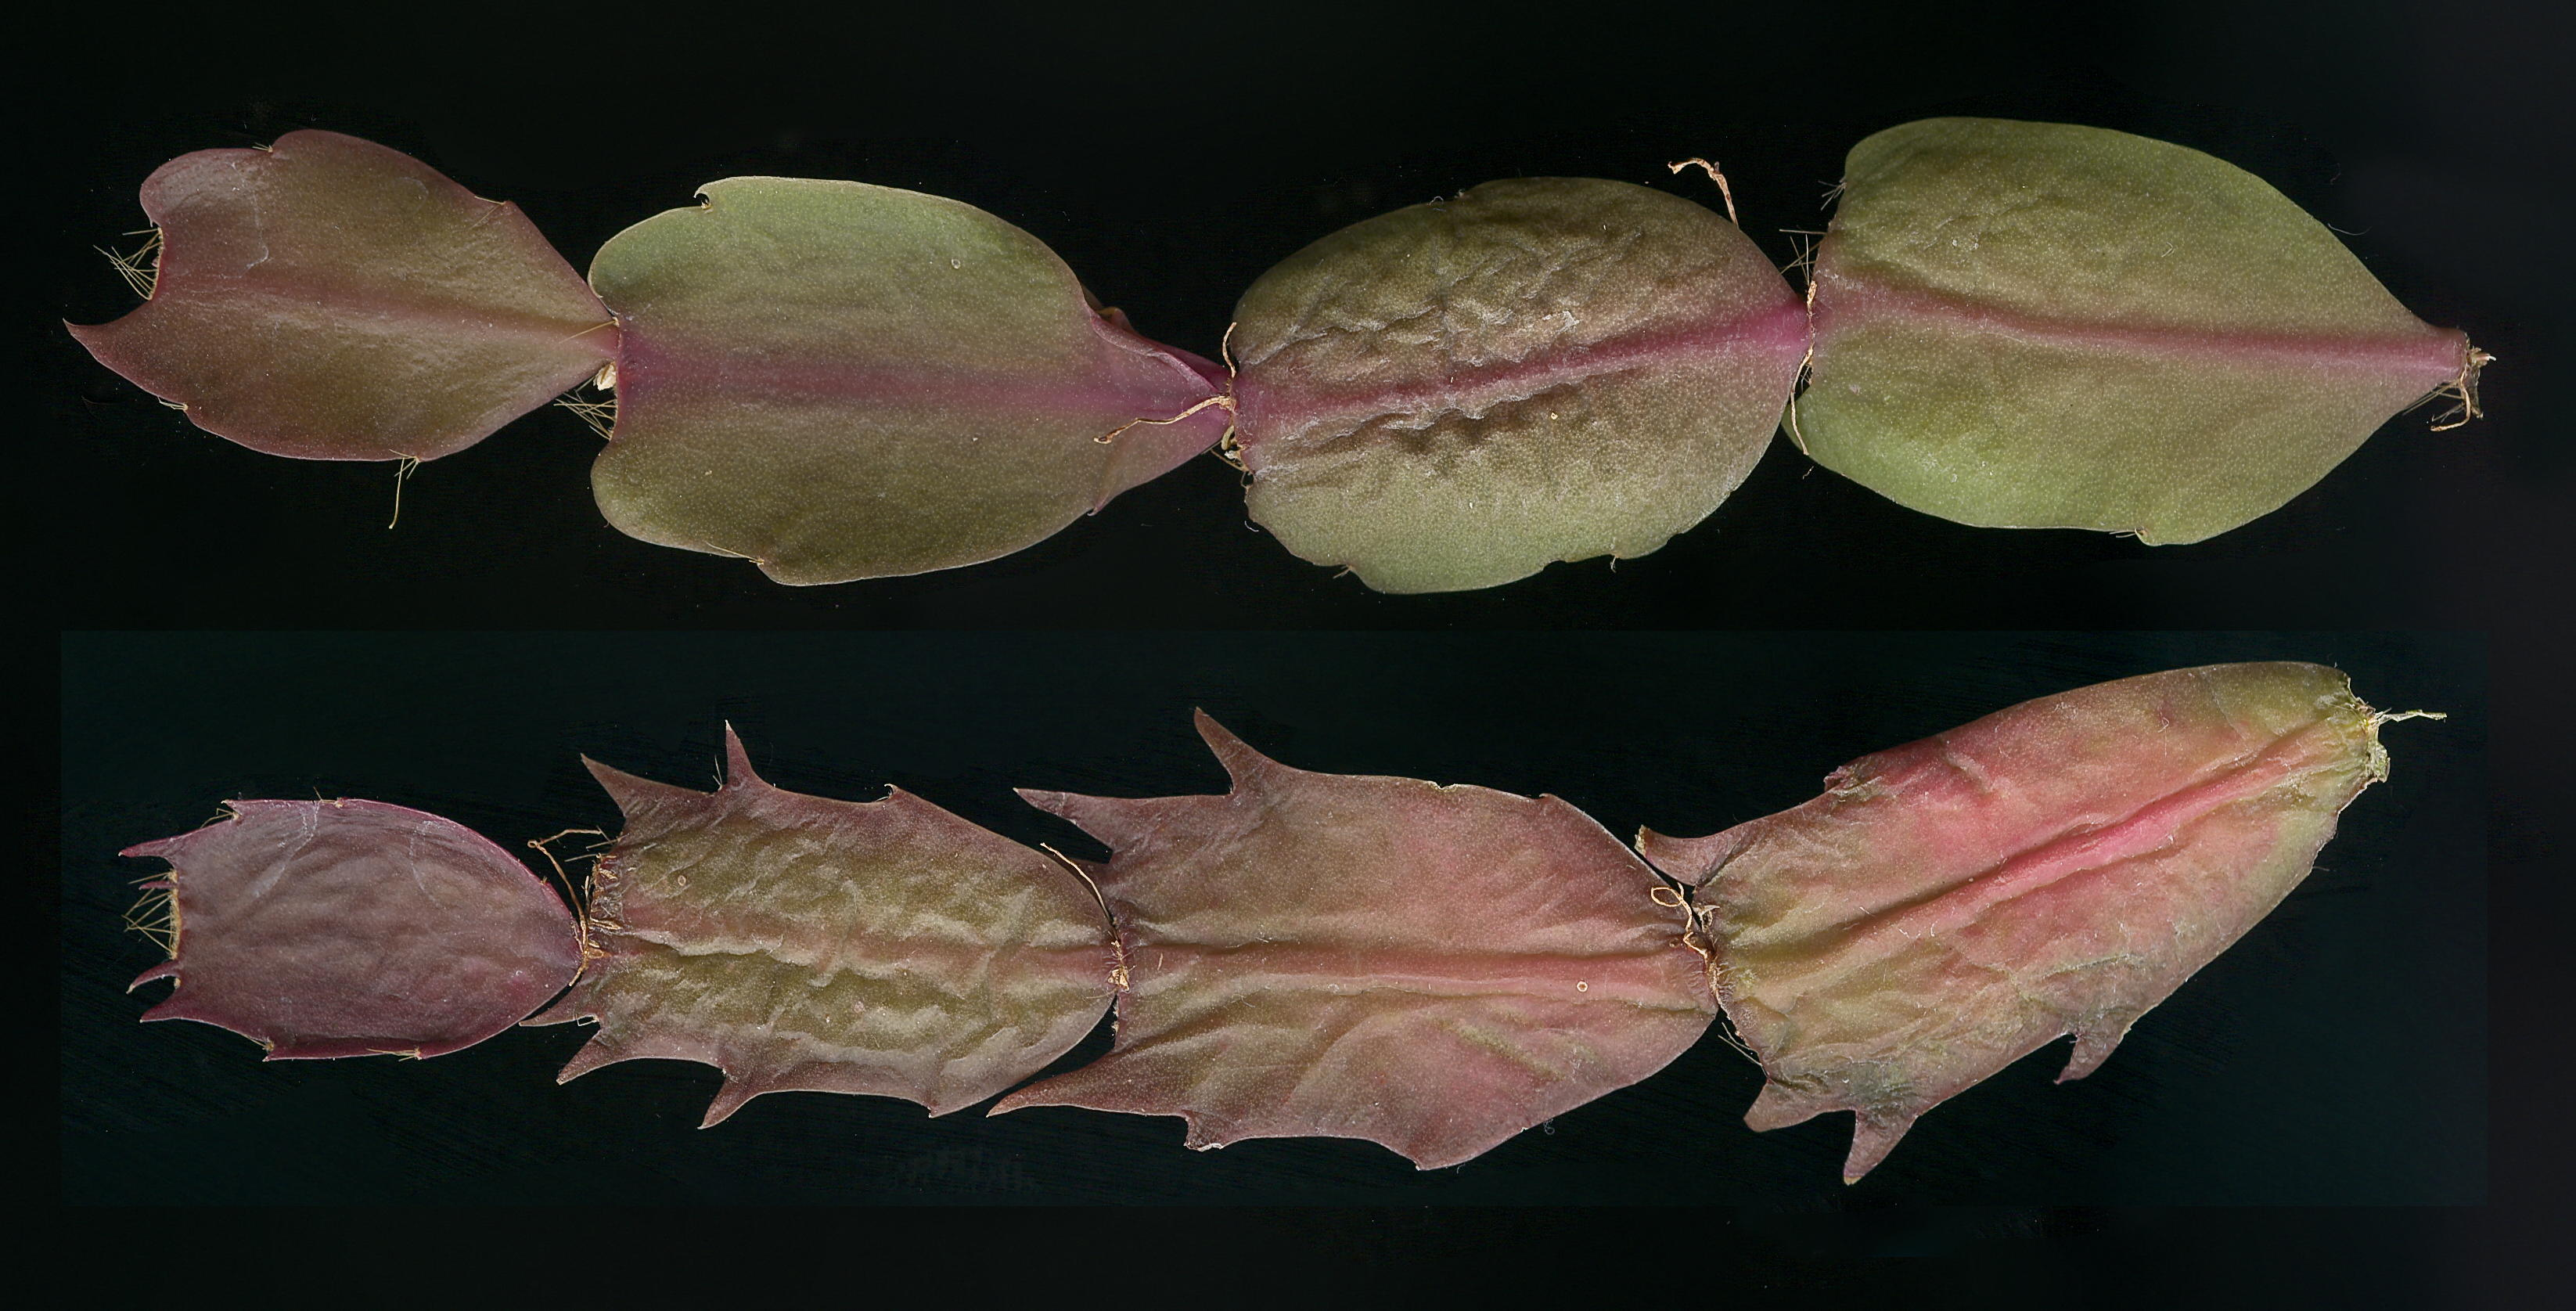 Variation in stem shapes in Schlumbergera cultivars: